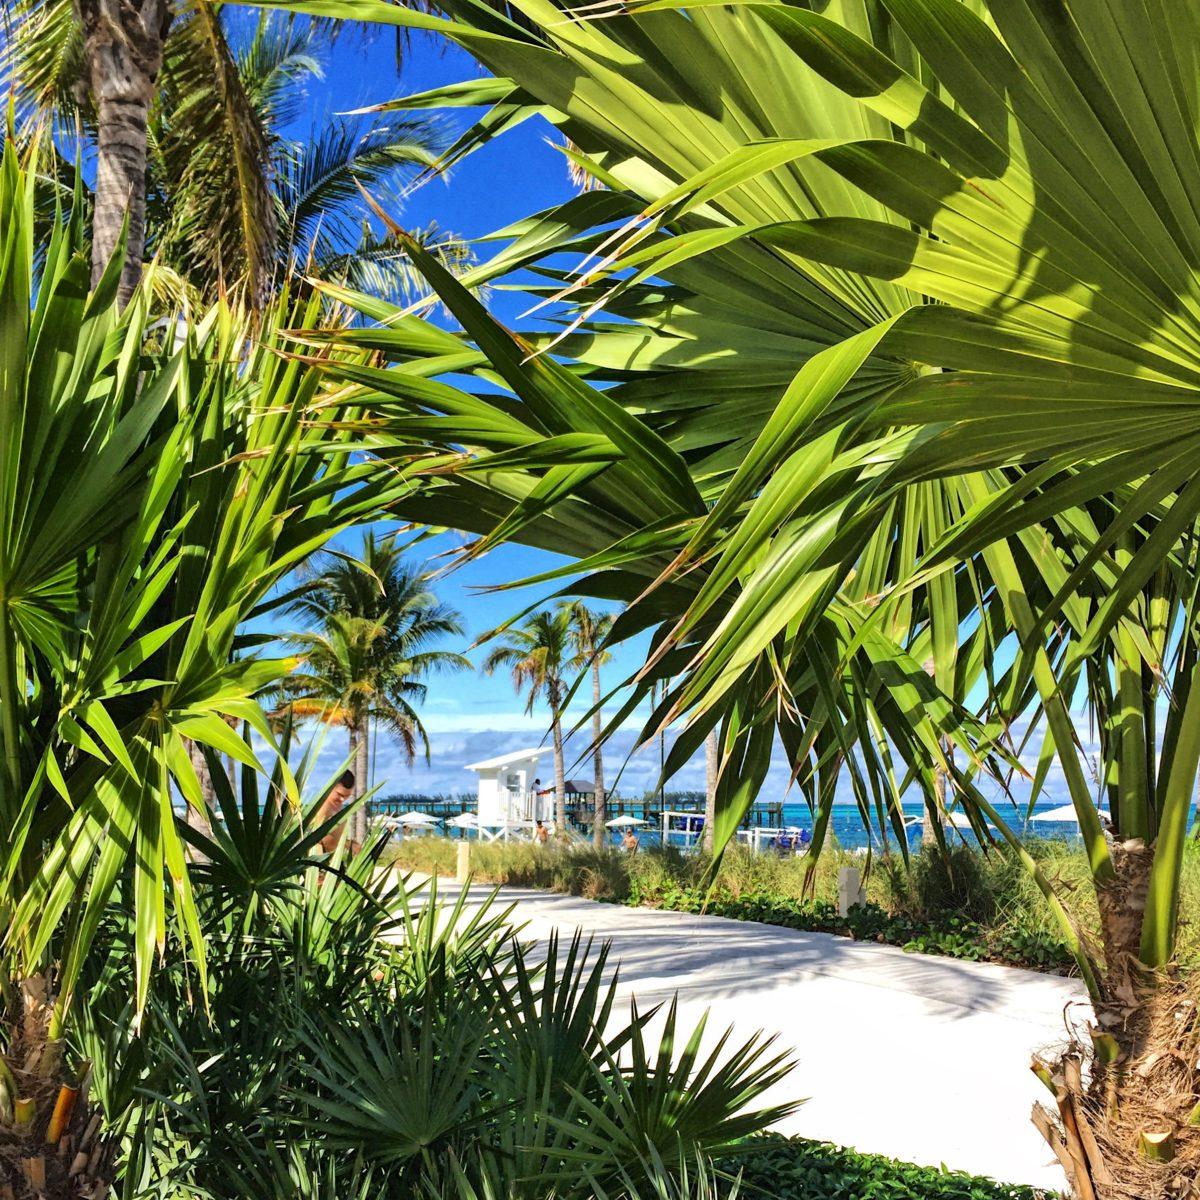 bahamas-voyage-séjour-rêve-eau-nassau-sandyport-airbnb-lestendancesdelilou-boris deltell-sorryformyfrench-magazine-monsieurmada.me-travel-vacances-caraibes-globe trotter-paradise-island-resort-Baha Mar